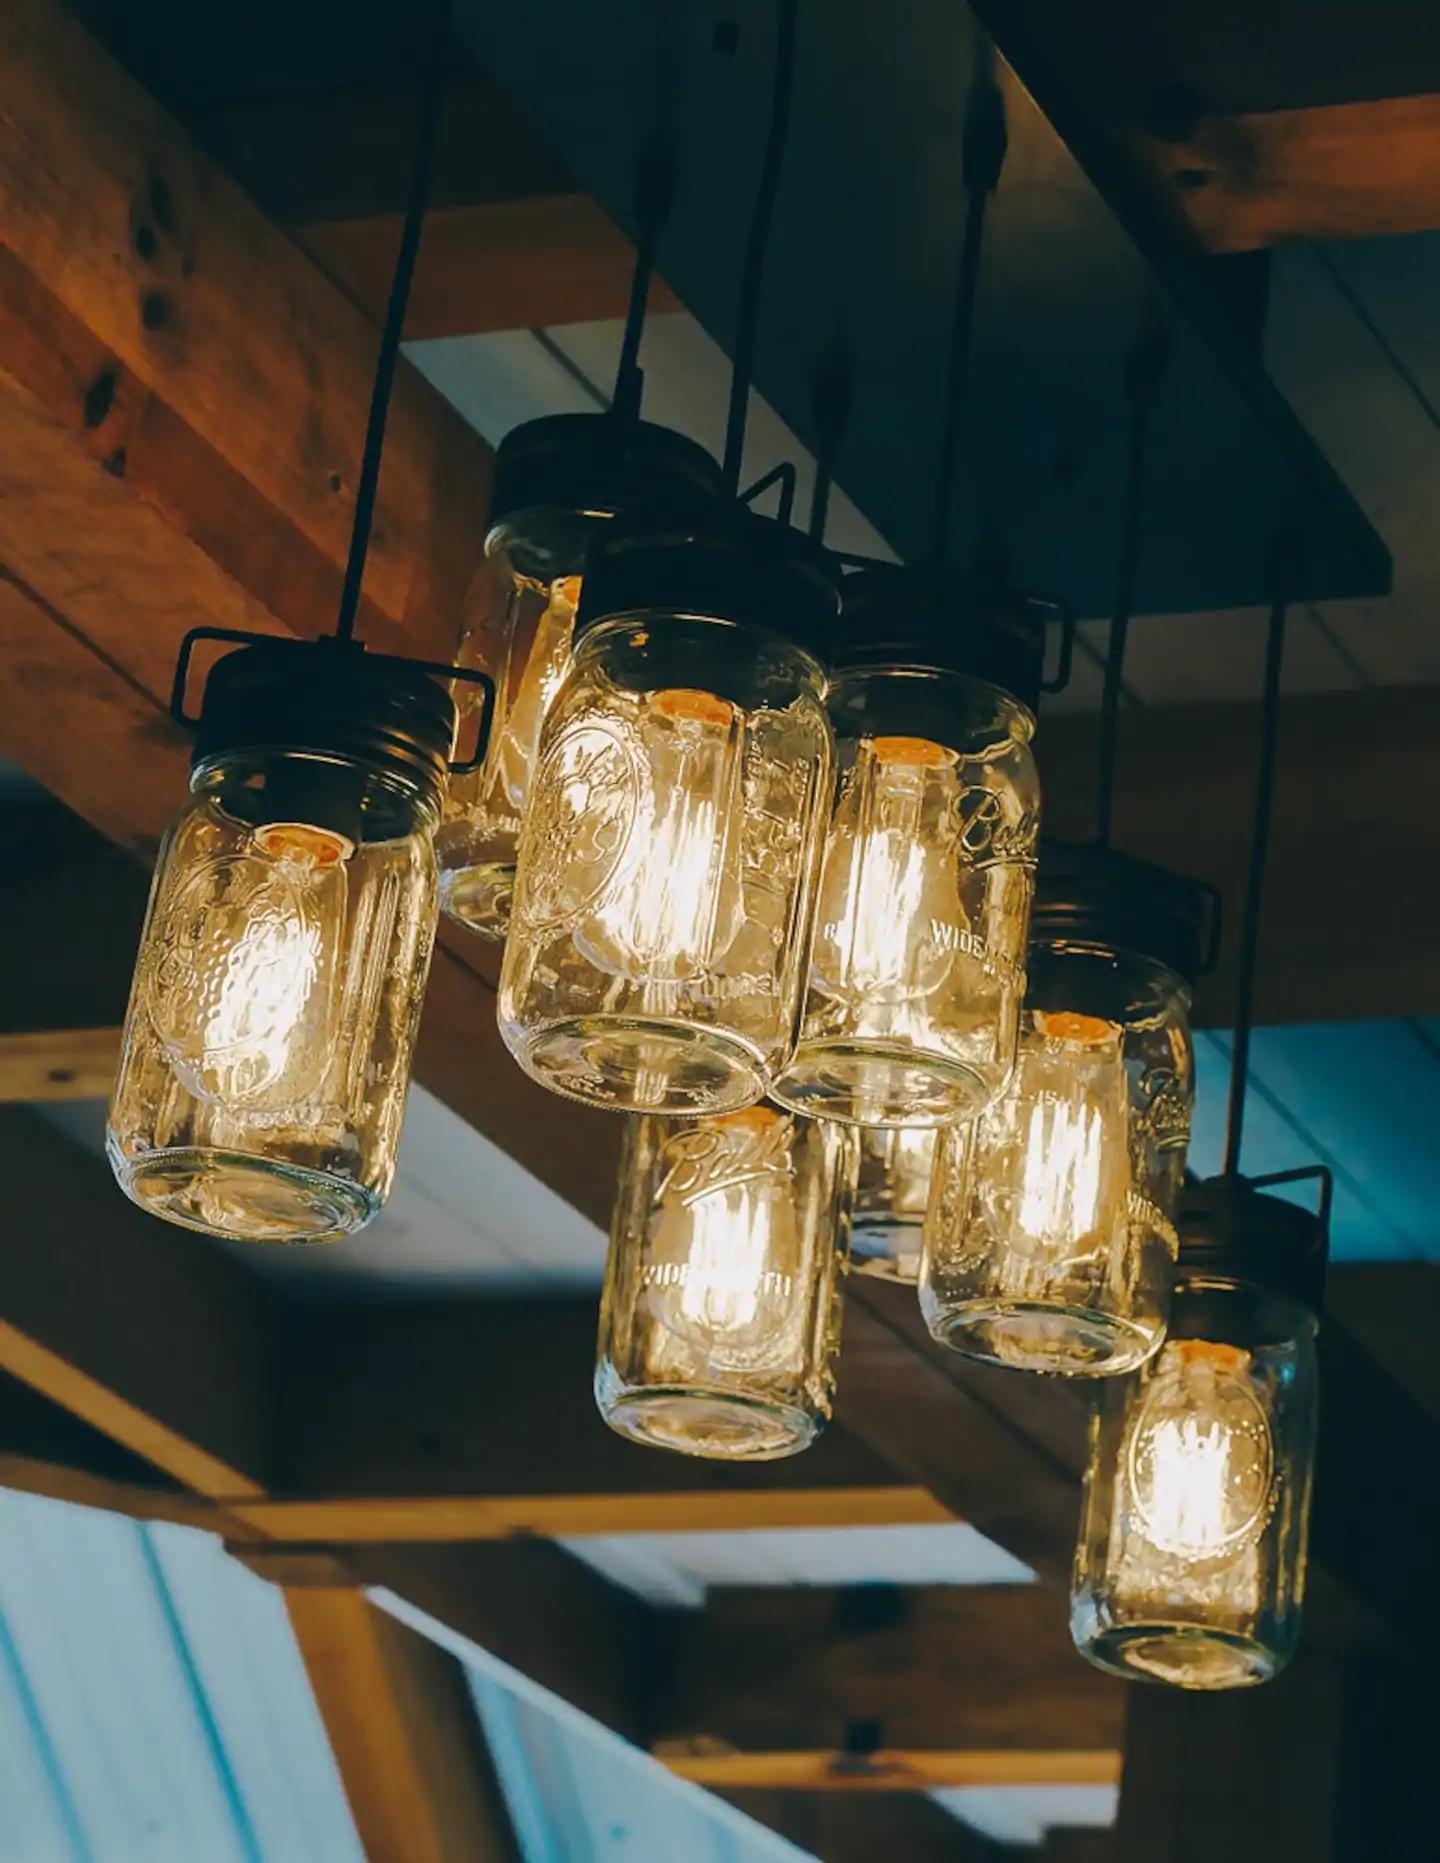 Tennessee Homemade Wines Airbnb mason jar lodge lights